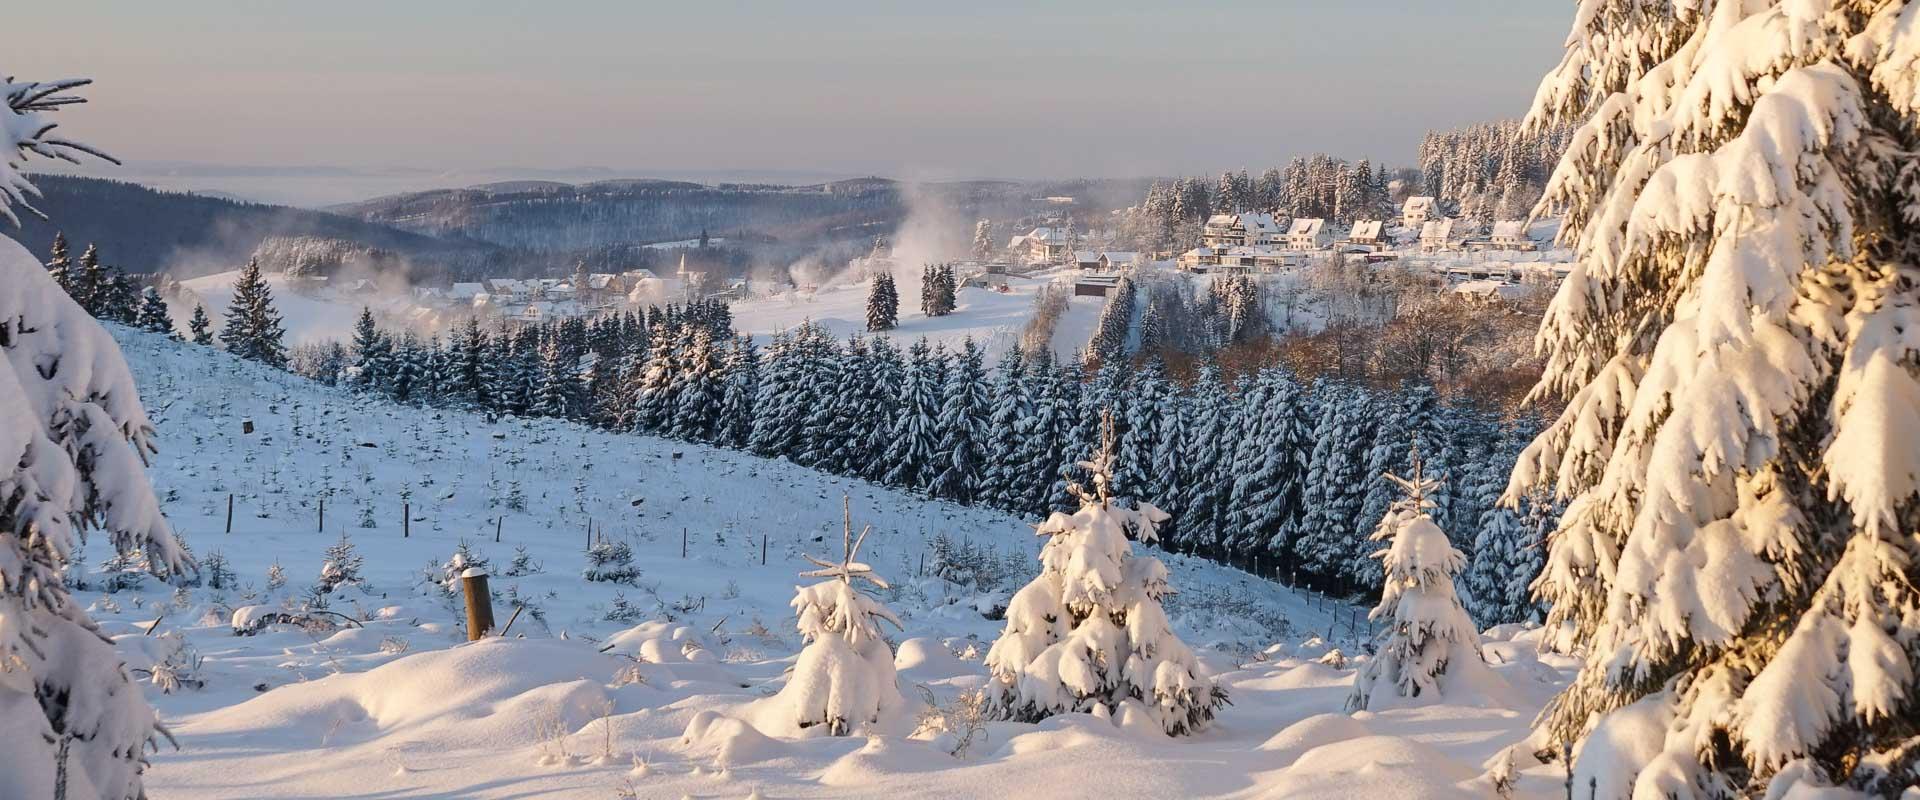 Winterzauber in Neuastenberg